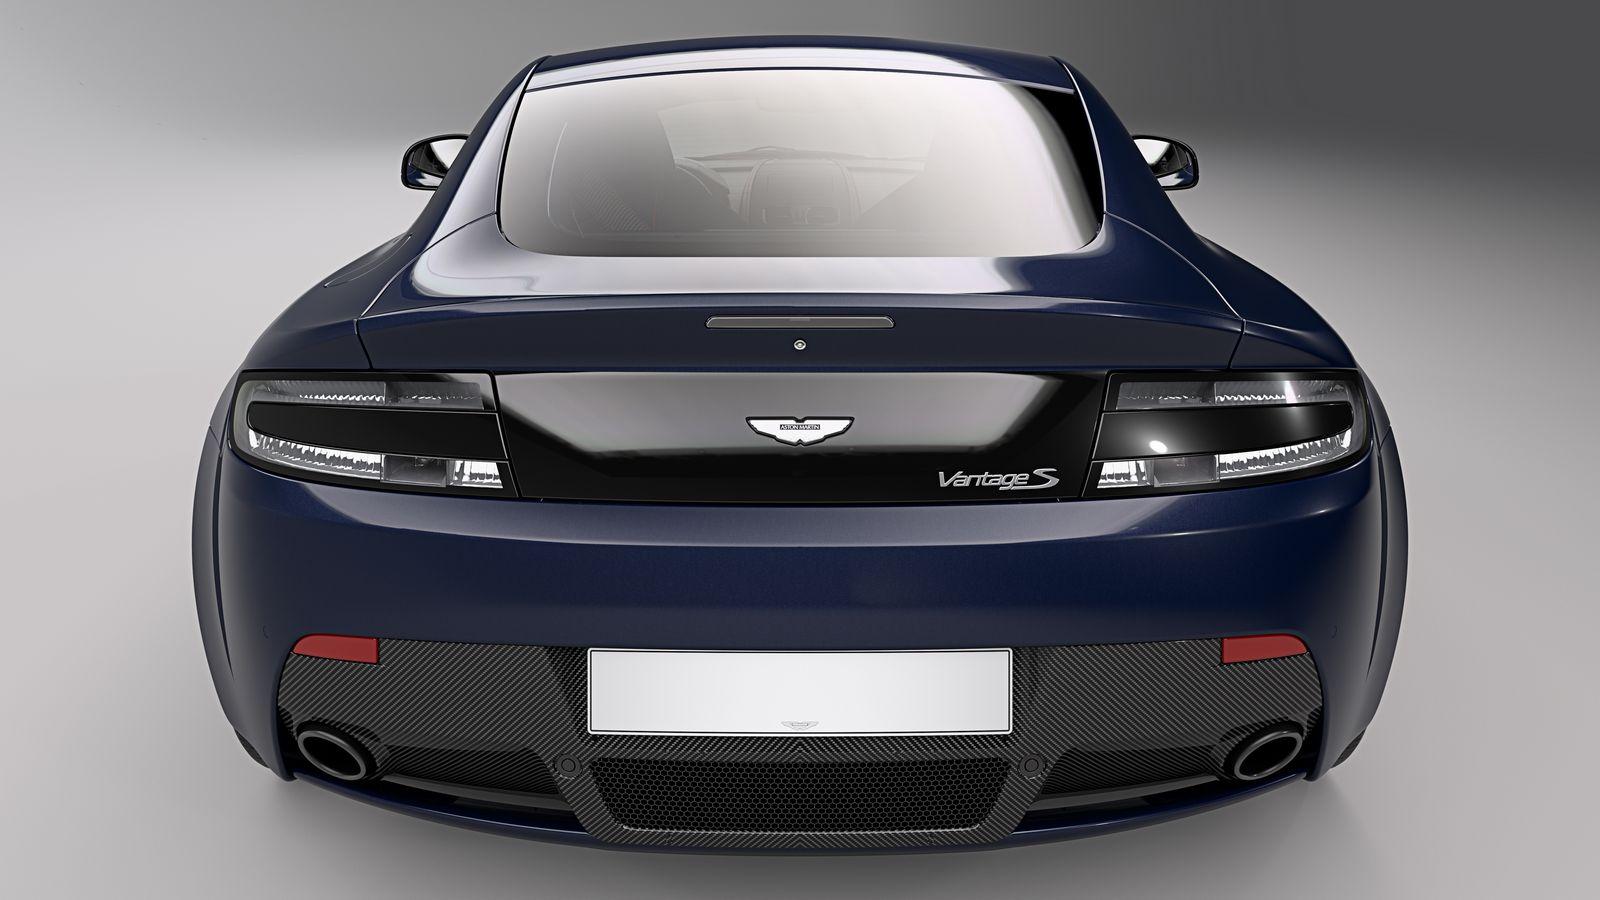 Aston Martin V8 and V12 Vantage Red Bull Racing Editions (8)